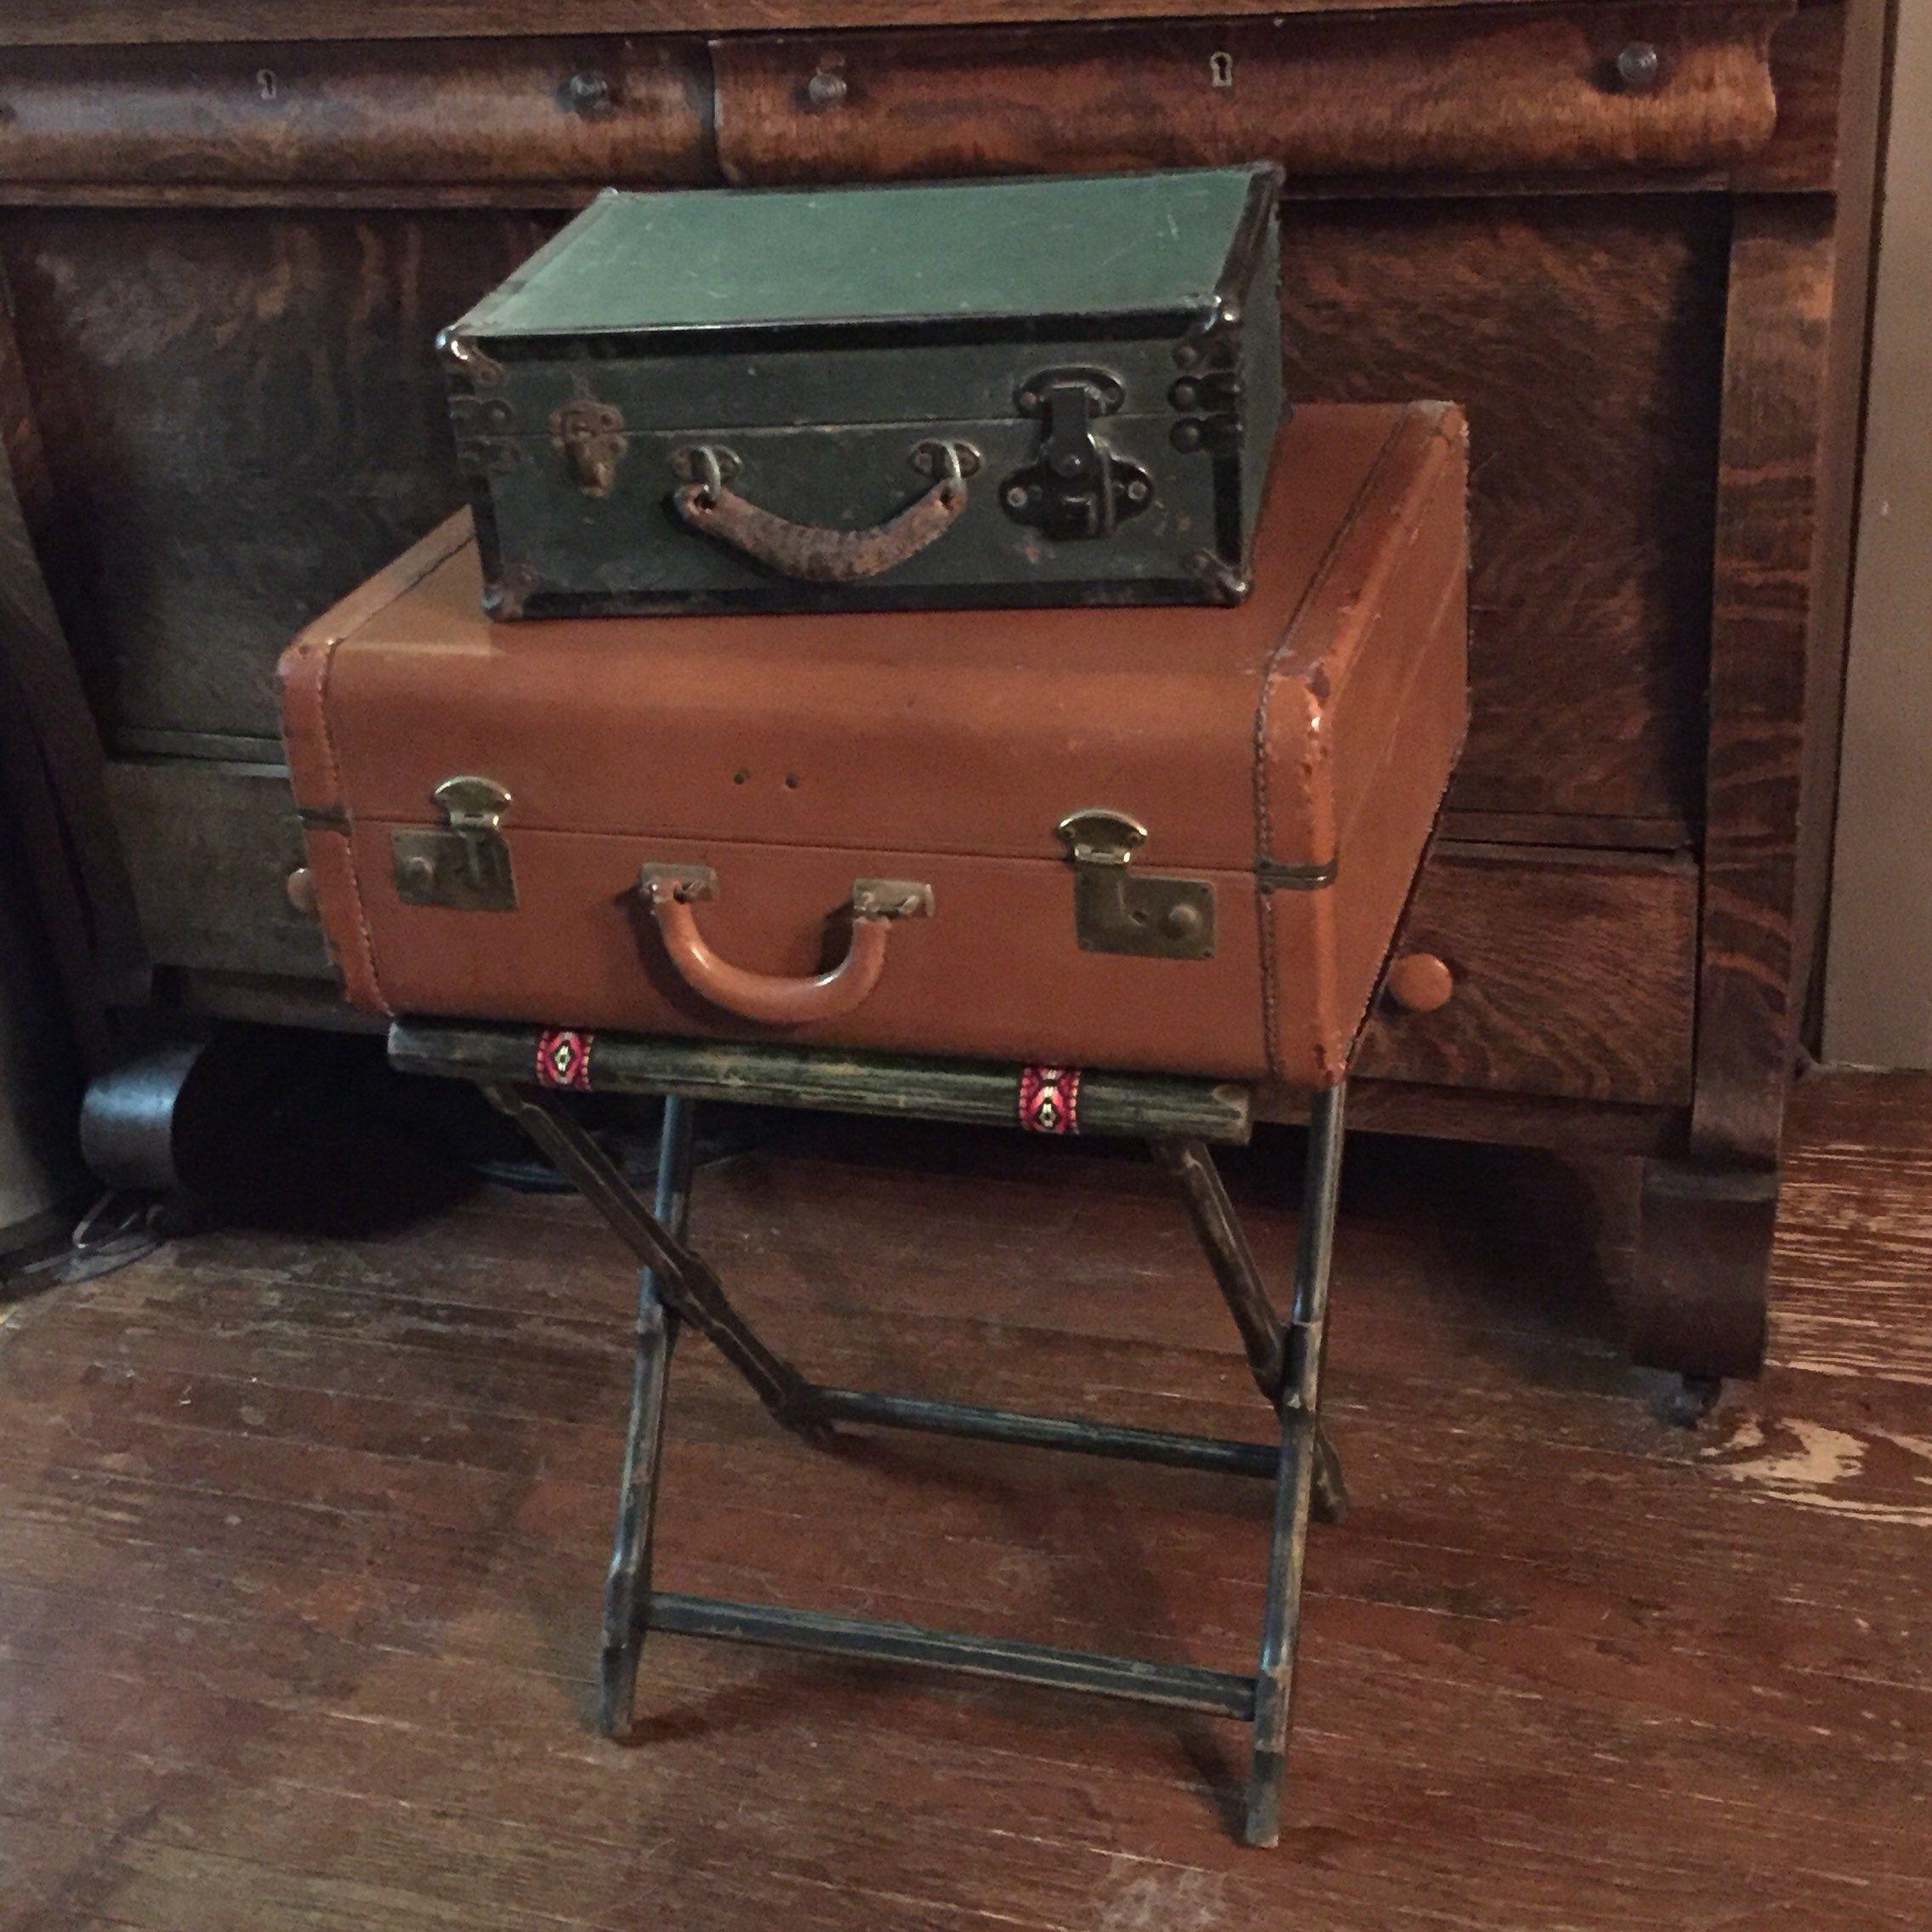 Luggage Rack for Bedroom Elegant Vintage Folding Wooden Luggage Stand Straight Leg Luggage